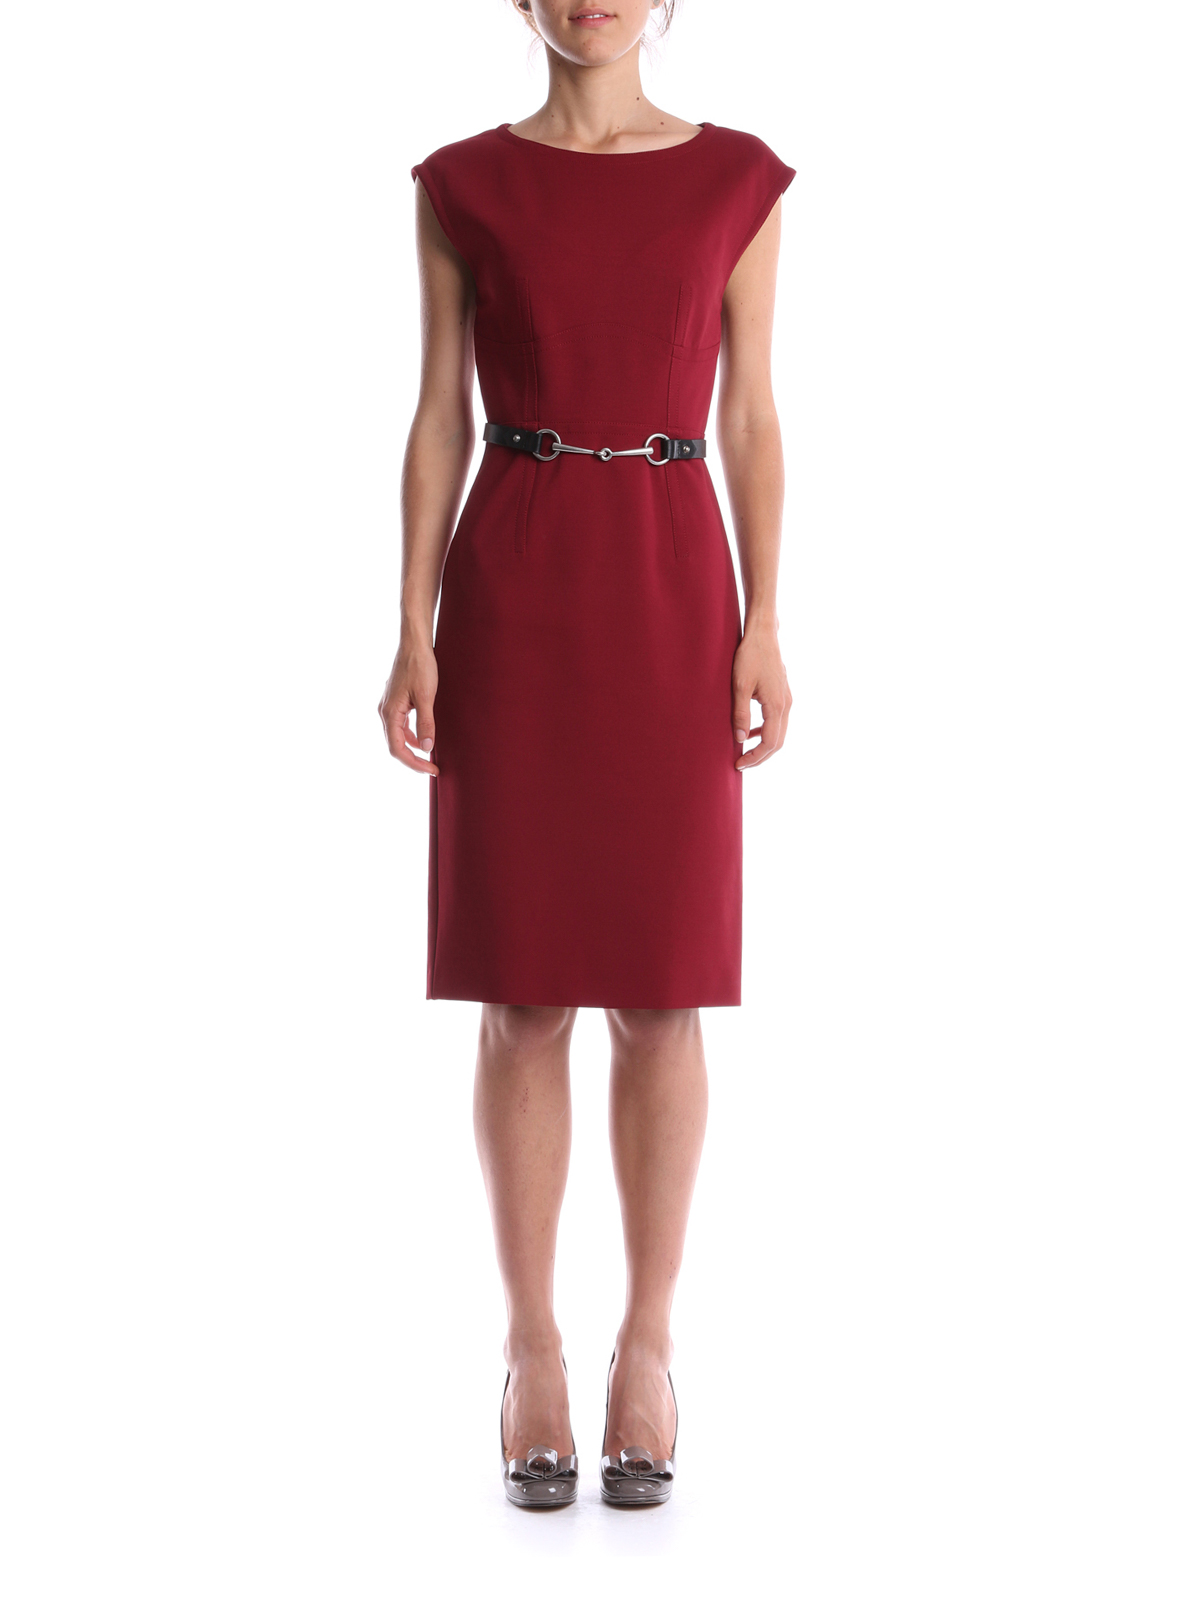 7c0d71a8c Gucci - Belted dress - knee length dresses - 389840 X5568 218 ...